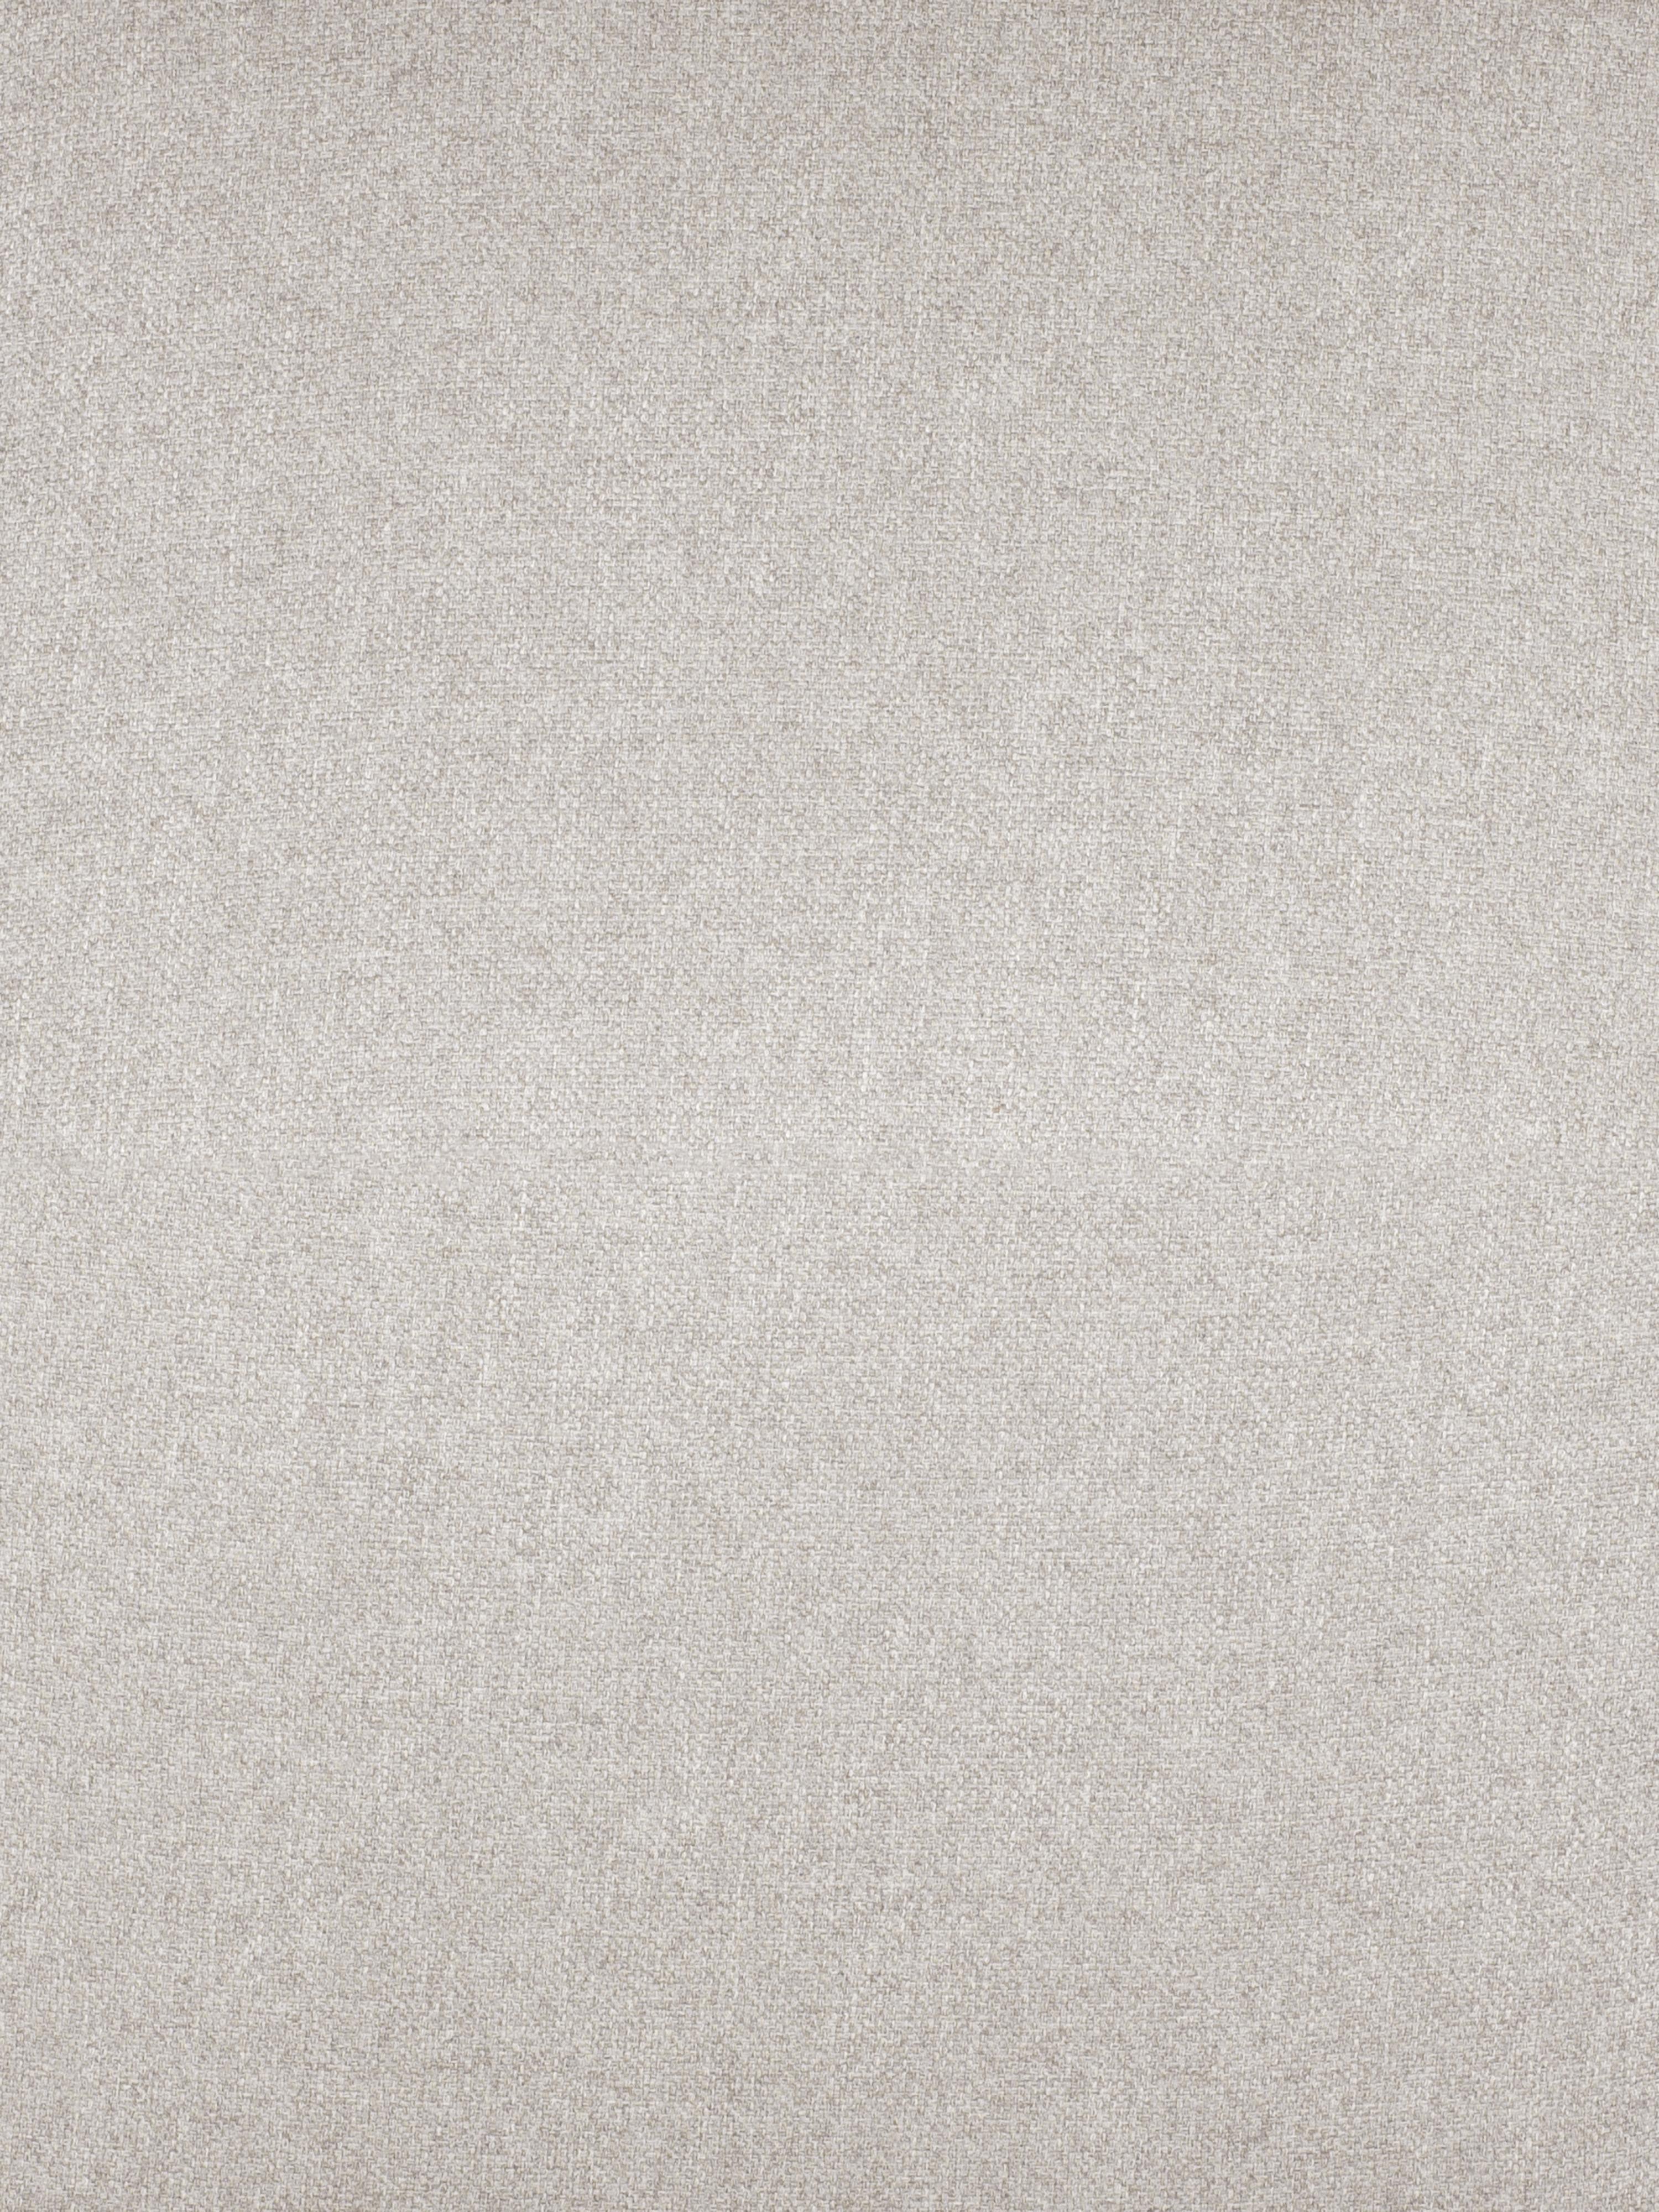 Fauteuil classique beige Fluente, Tissu beige